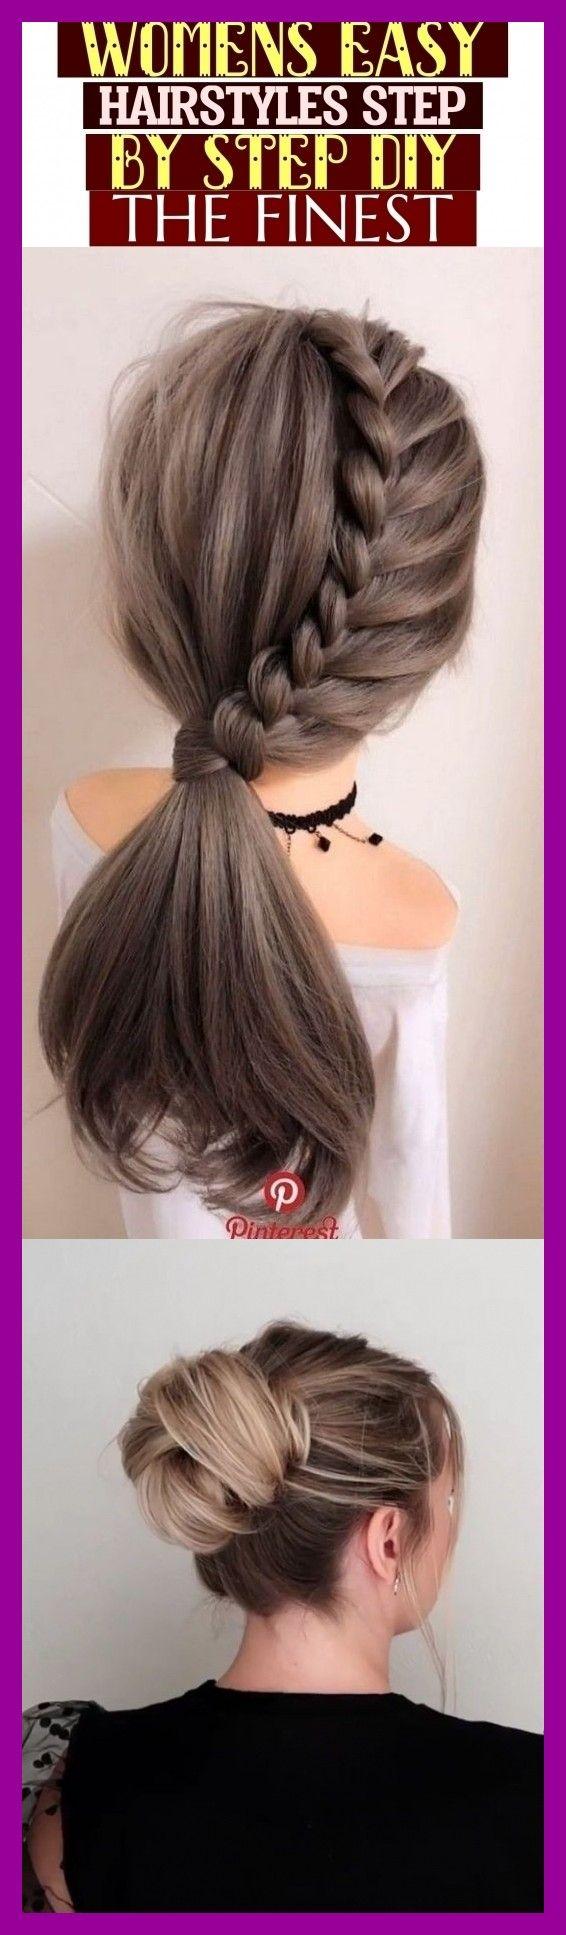 Peinados fáciles para mujeres Paso a paso Diy – The Finest #naturalhair #hairstylesdi …